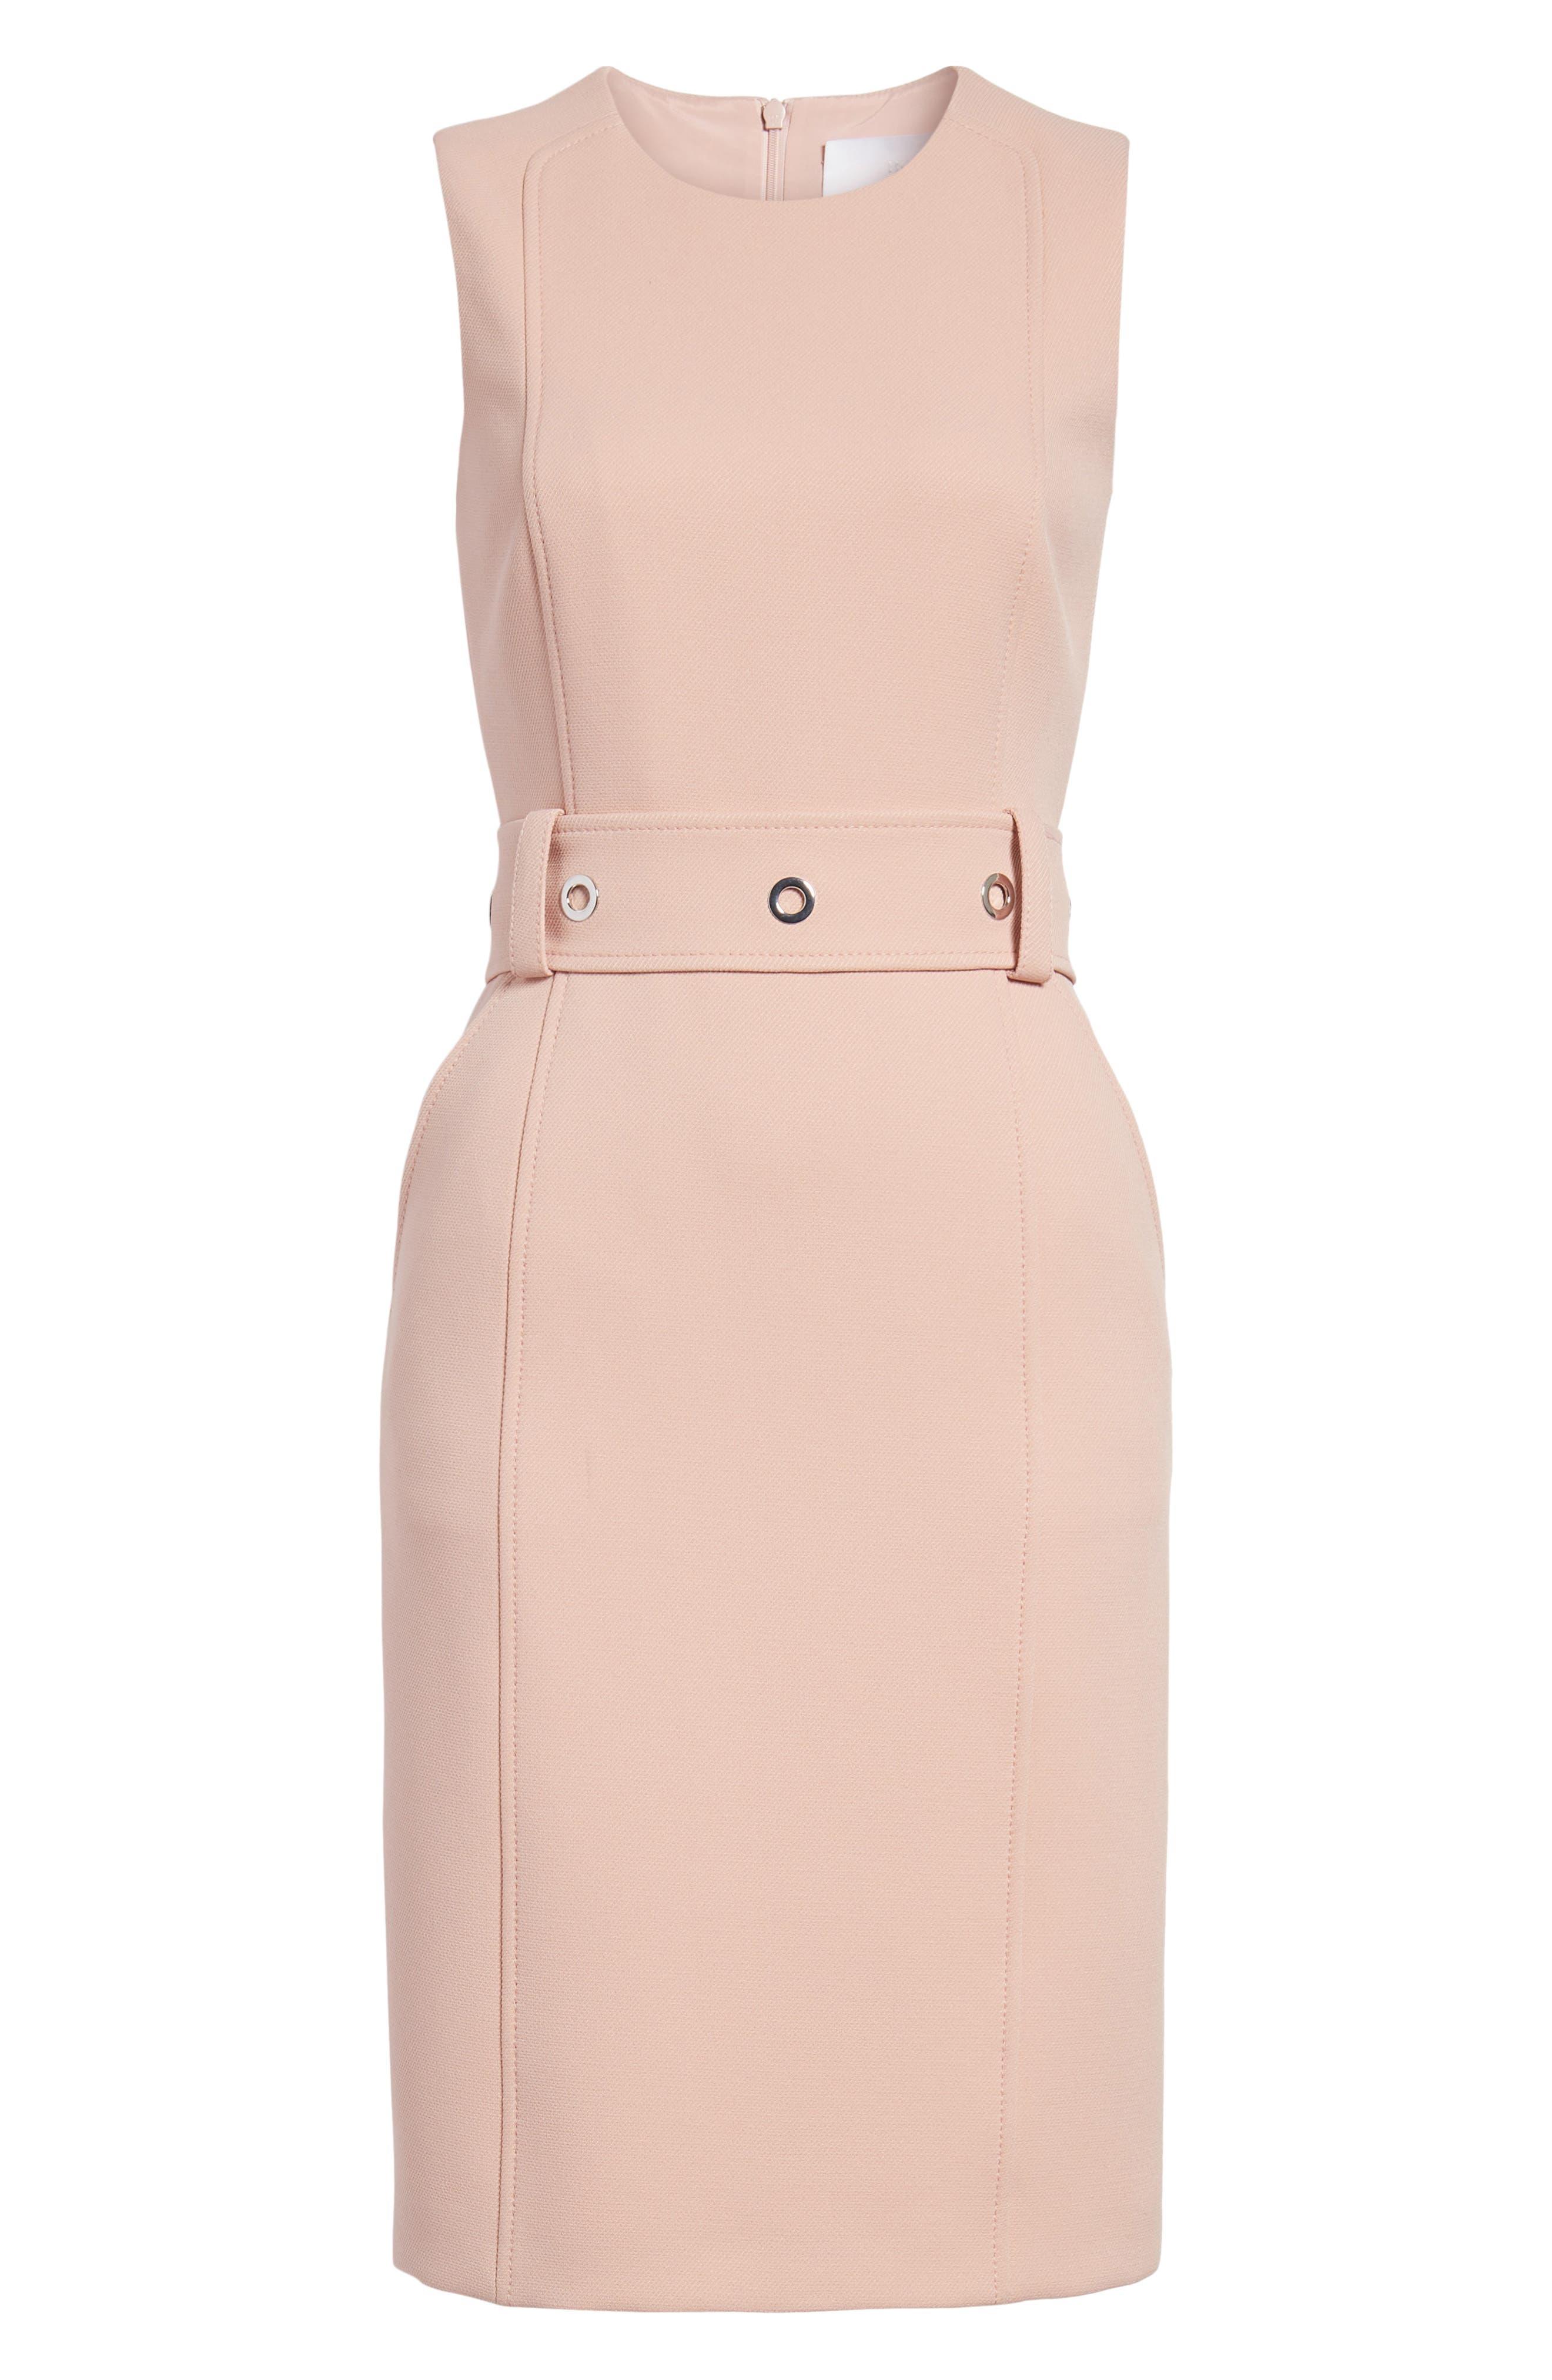 Duleama Compact Twill Dress,                             Alternate thumbnail 7, color,                             Blush